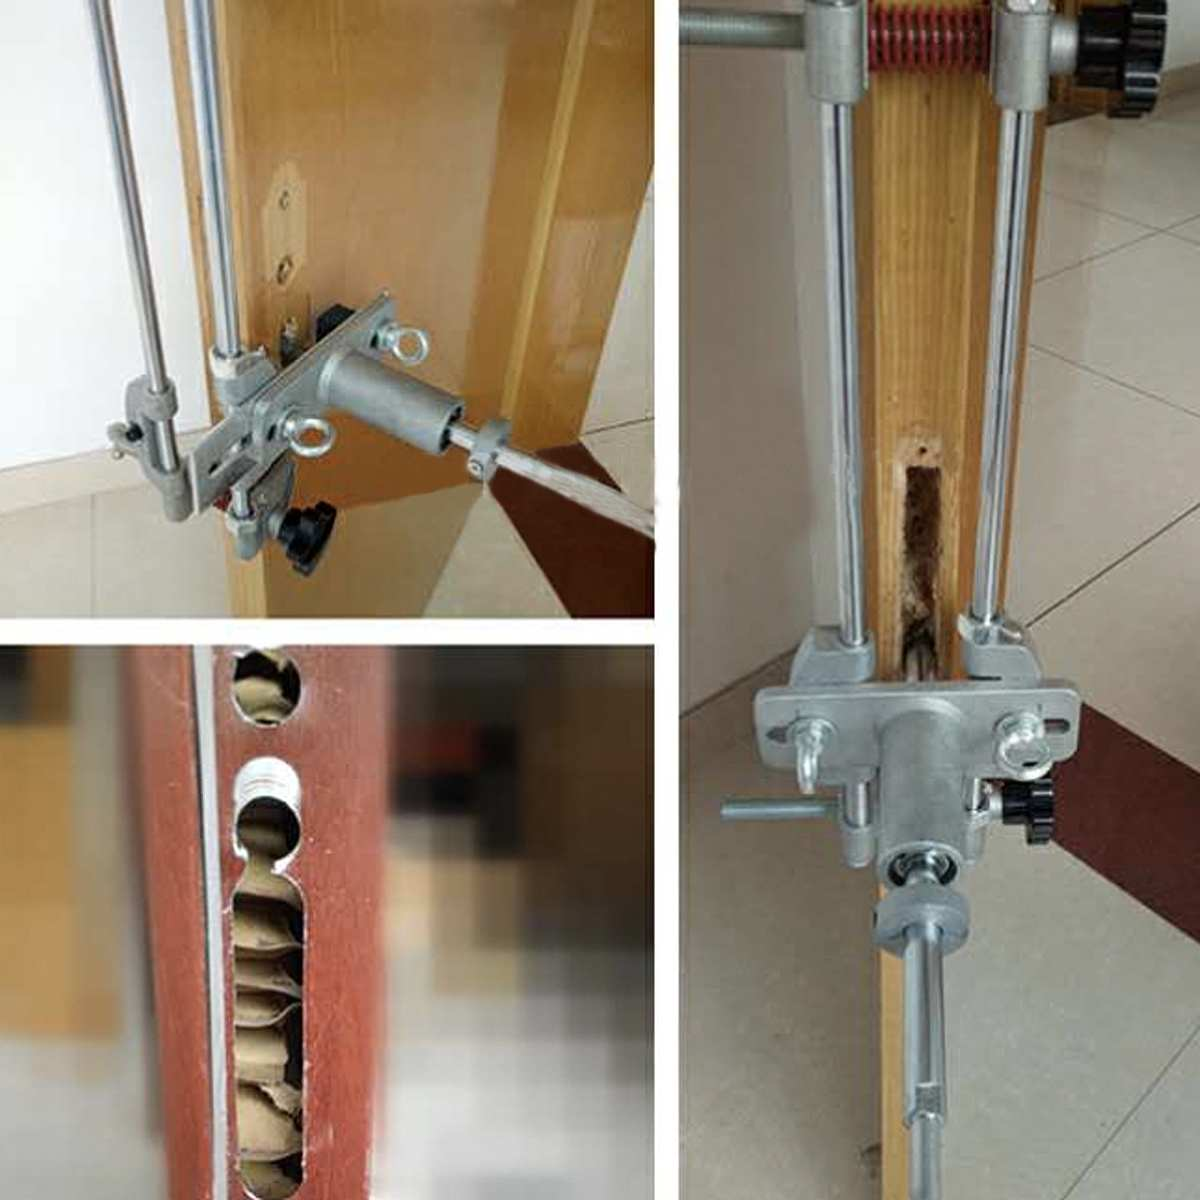 Tools : 8 Pcs Mortice Door Fitting Jig Lock Mortiser DBB Key JIG1 With 3 Cutters Case Maintenance Security Tool Door Lock Mortice Kit